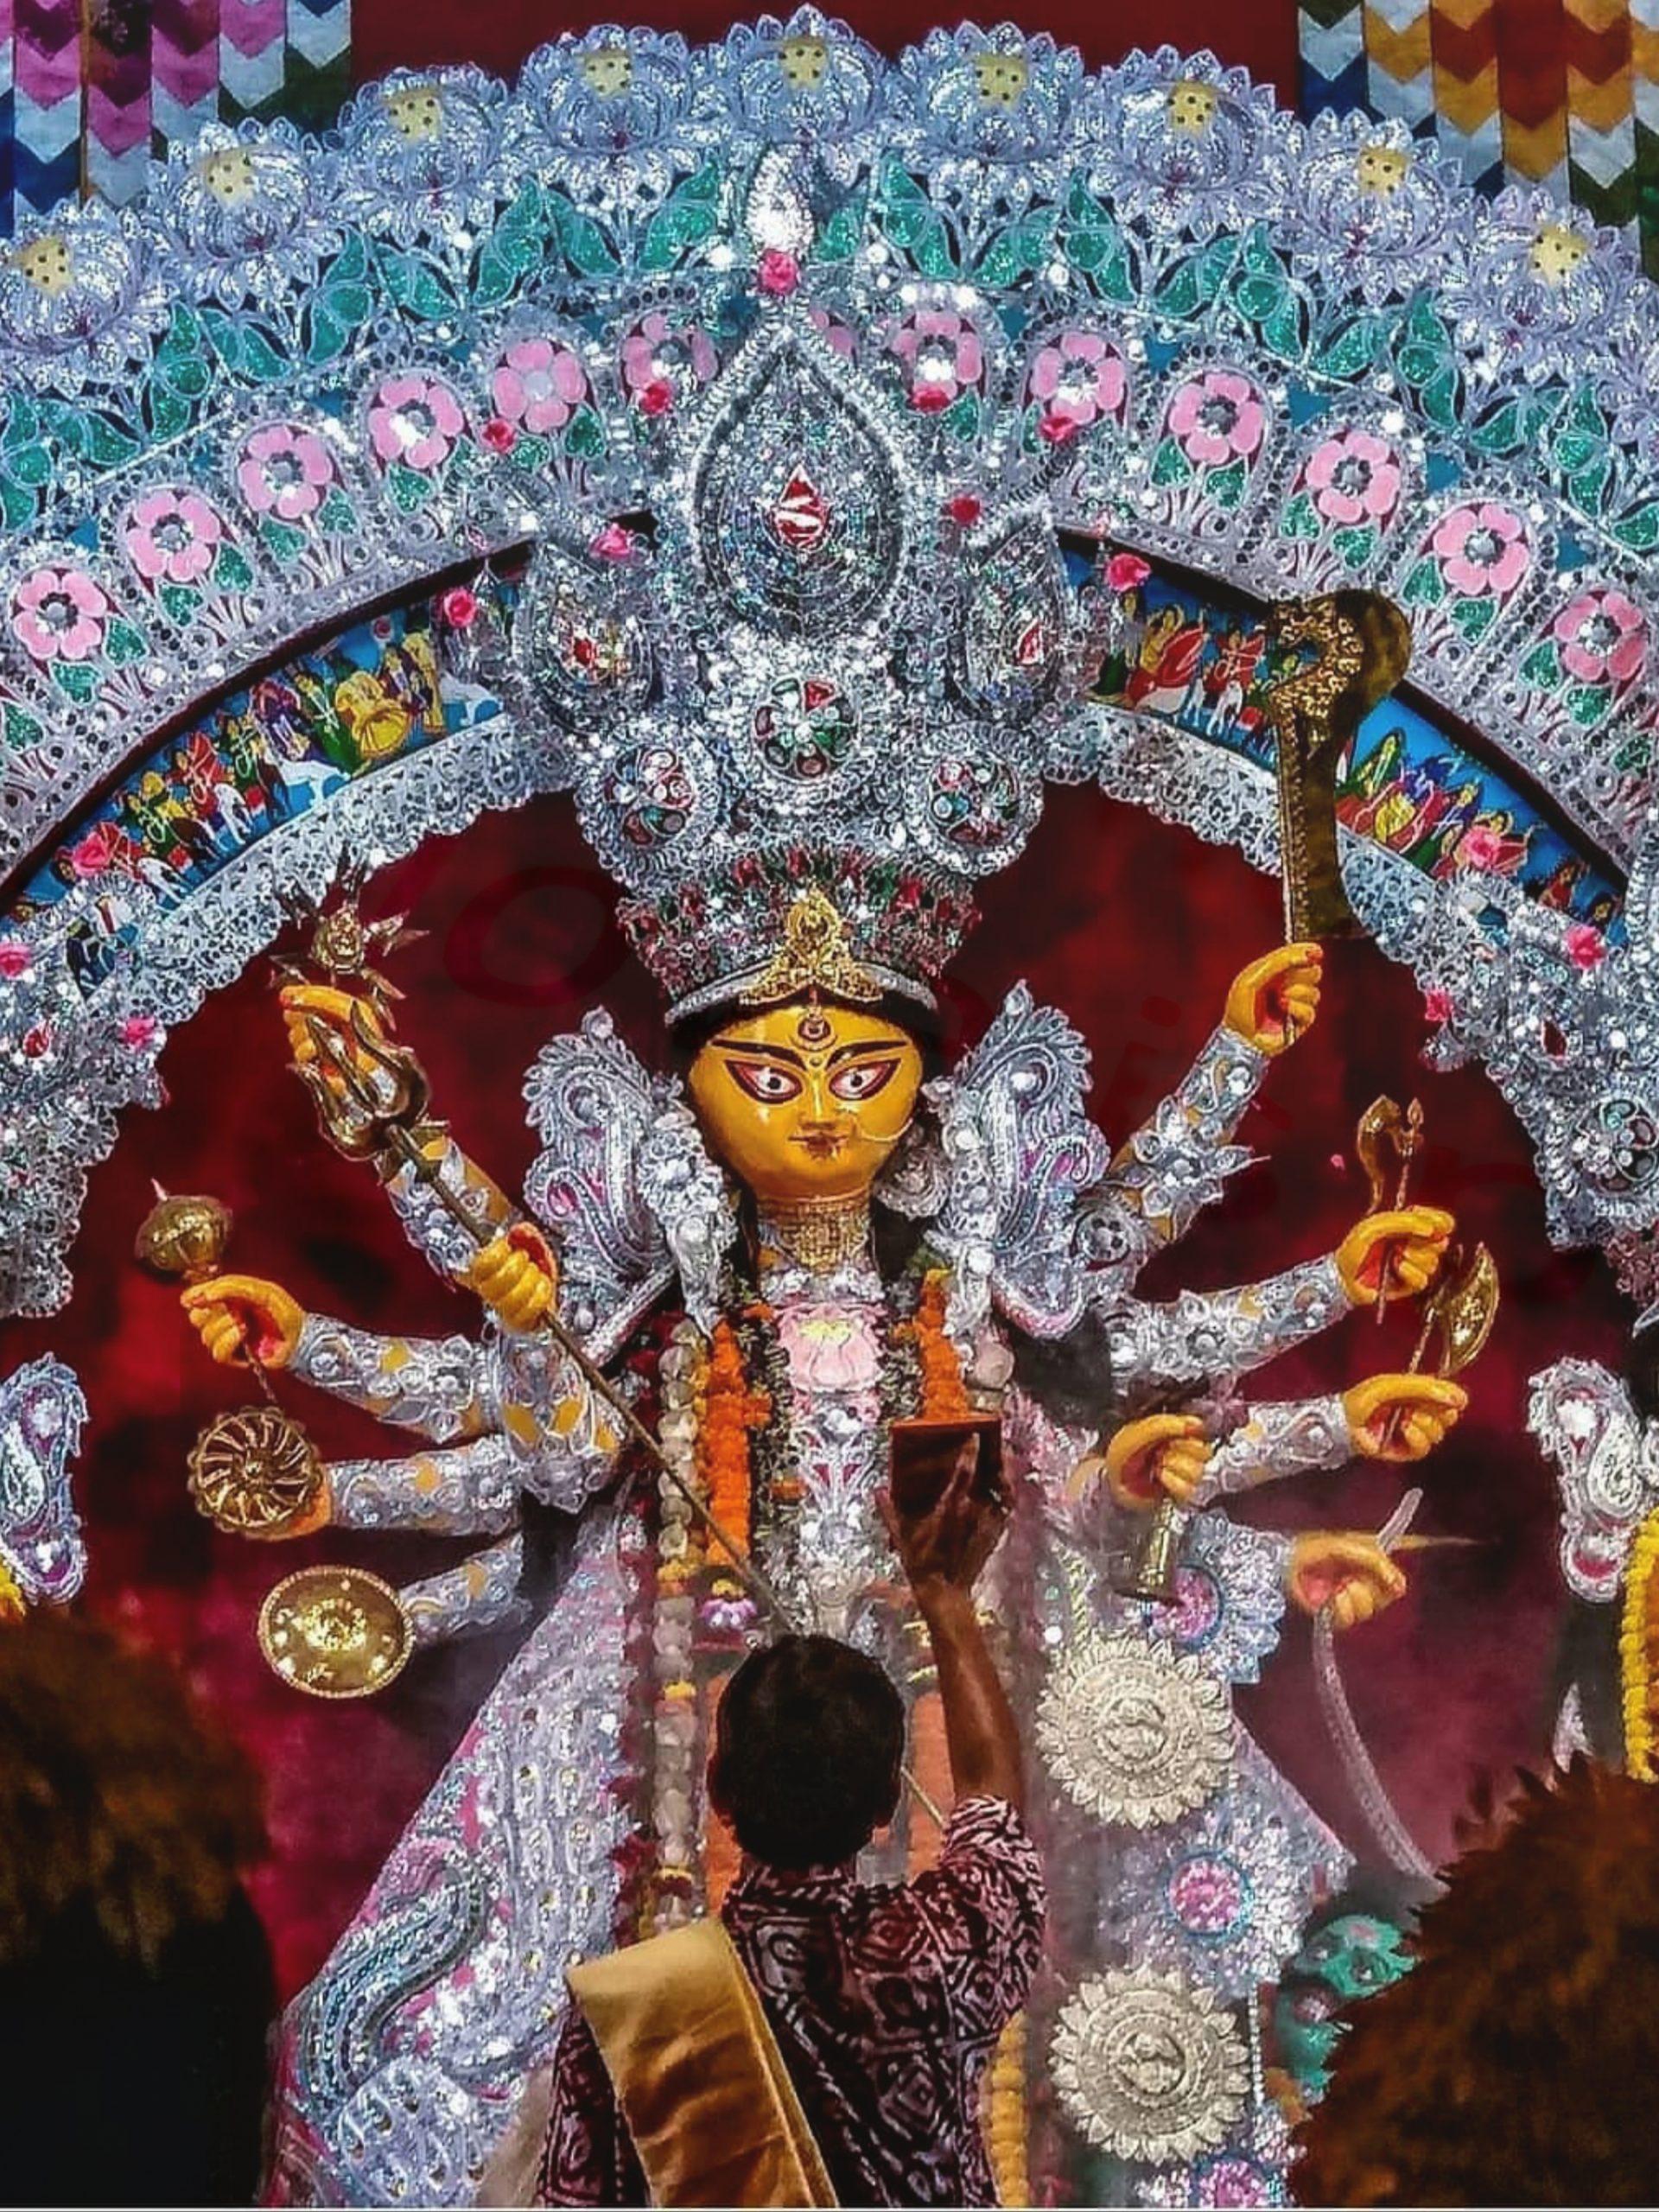 A big idol of Goddess Durga